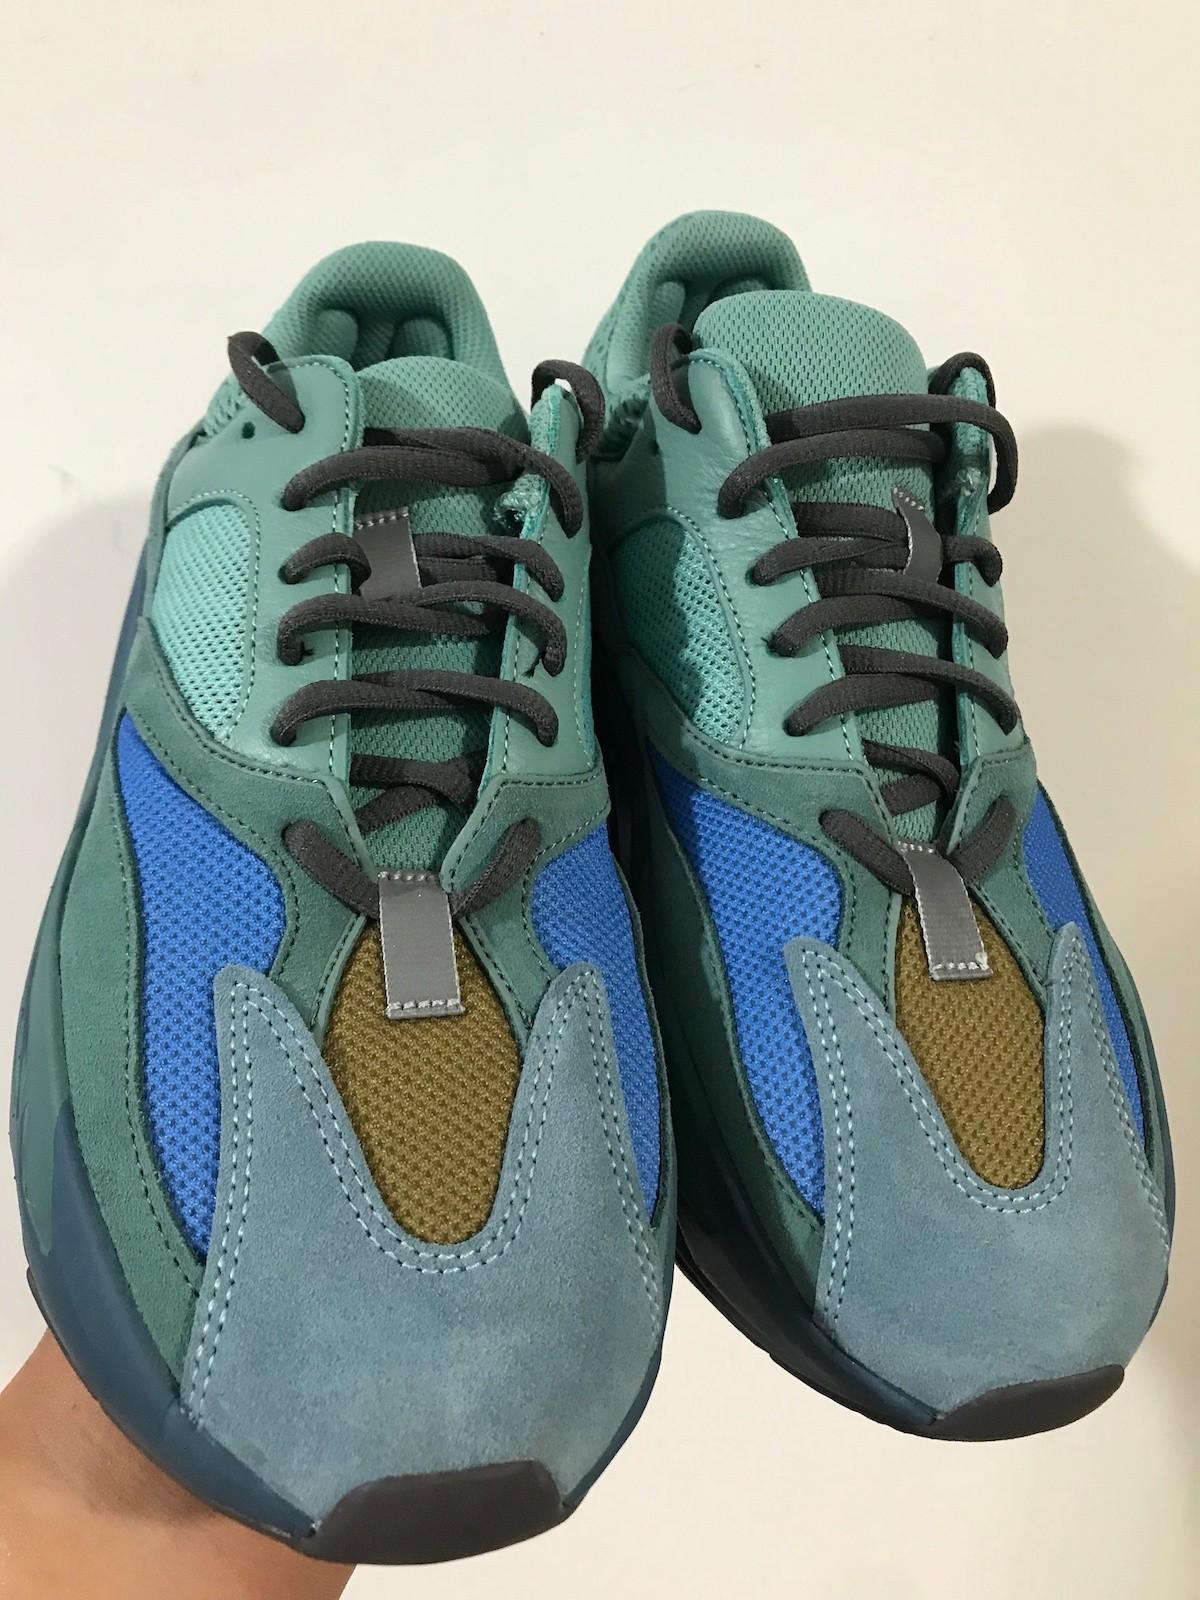 Faded Azure,700,Yeezy,adidas  一言难尽!「青铜器」Yeezy 700 实物曝光!网友:阳间点好吗...